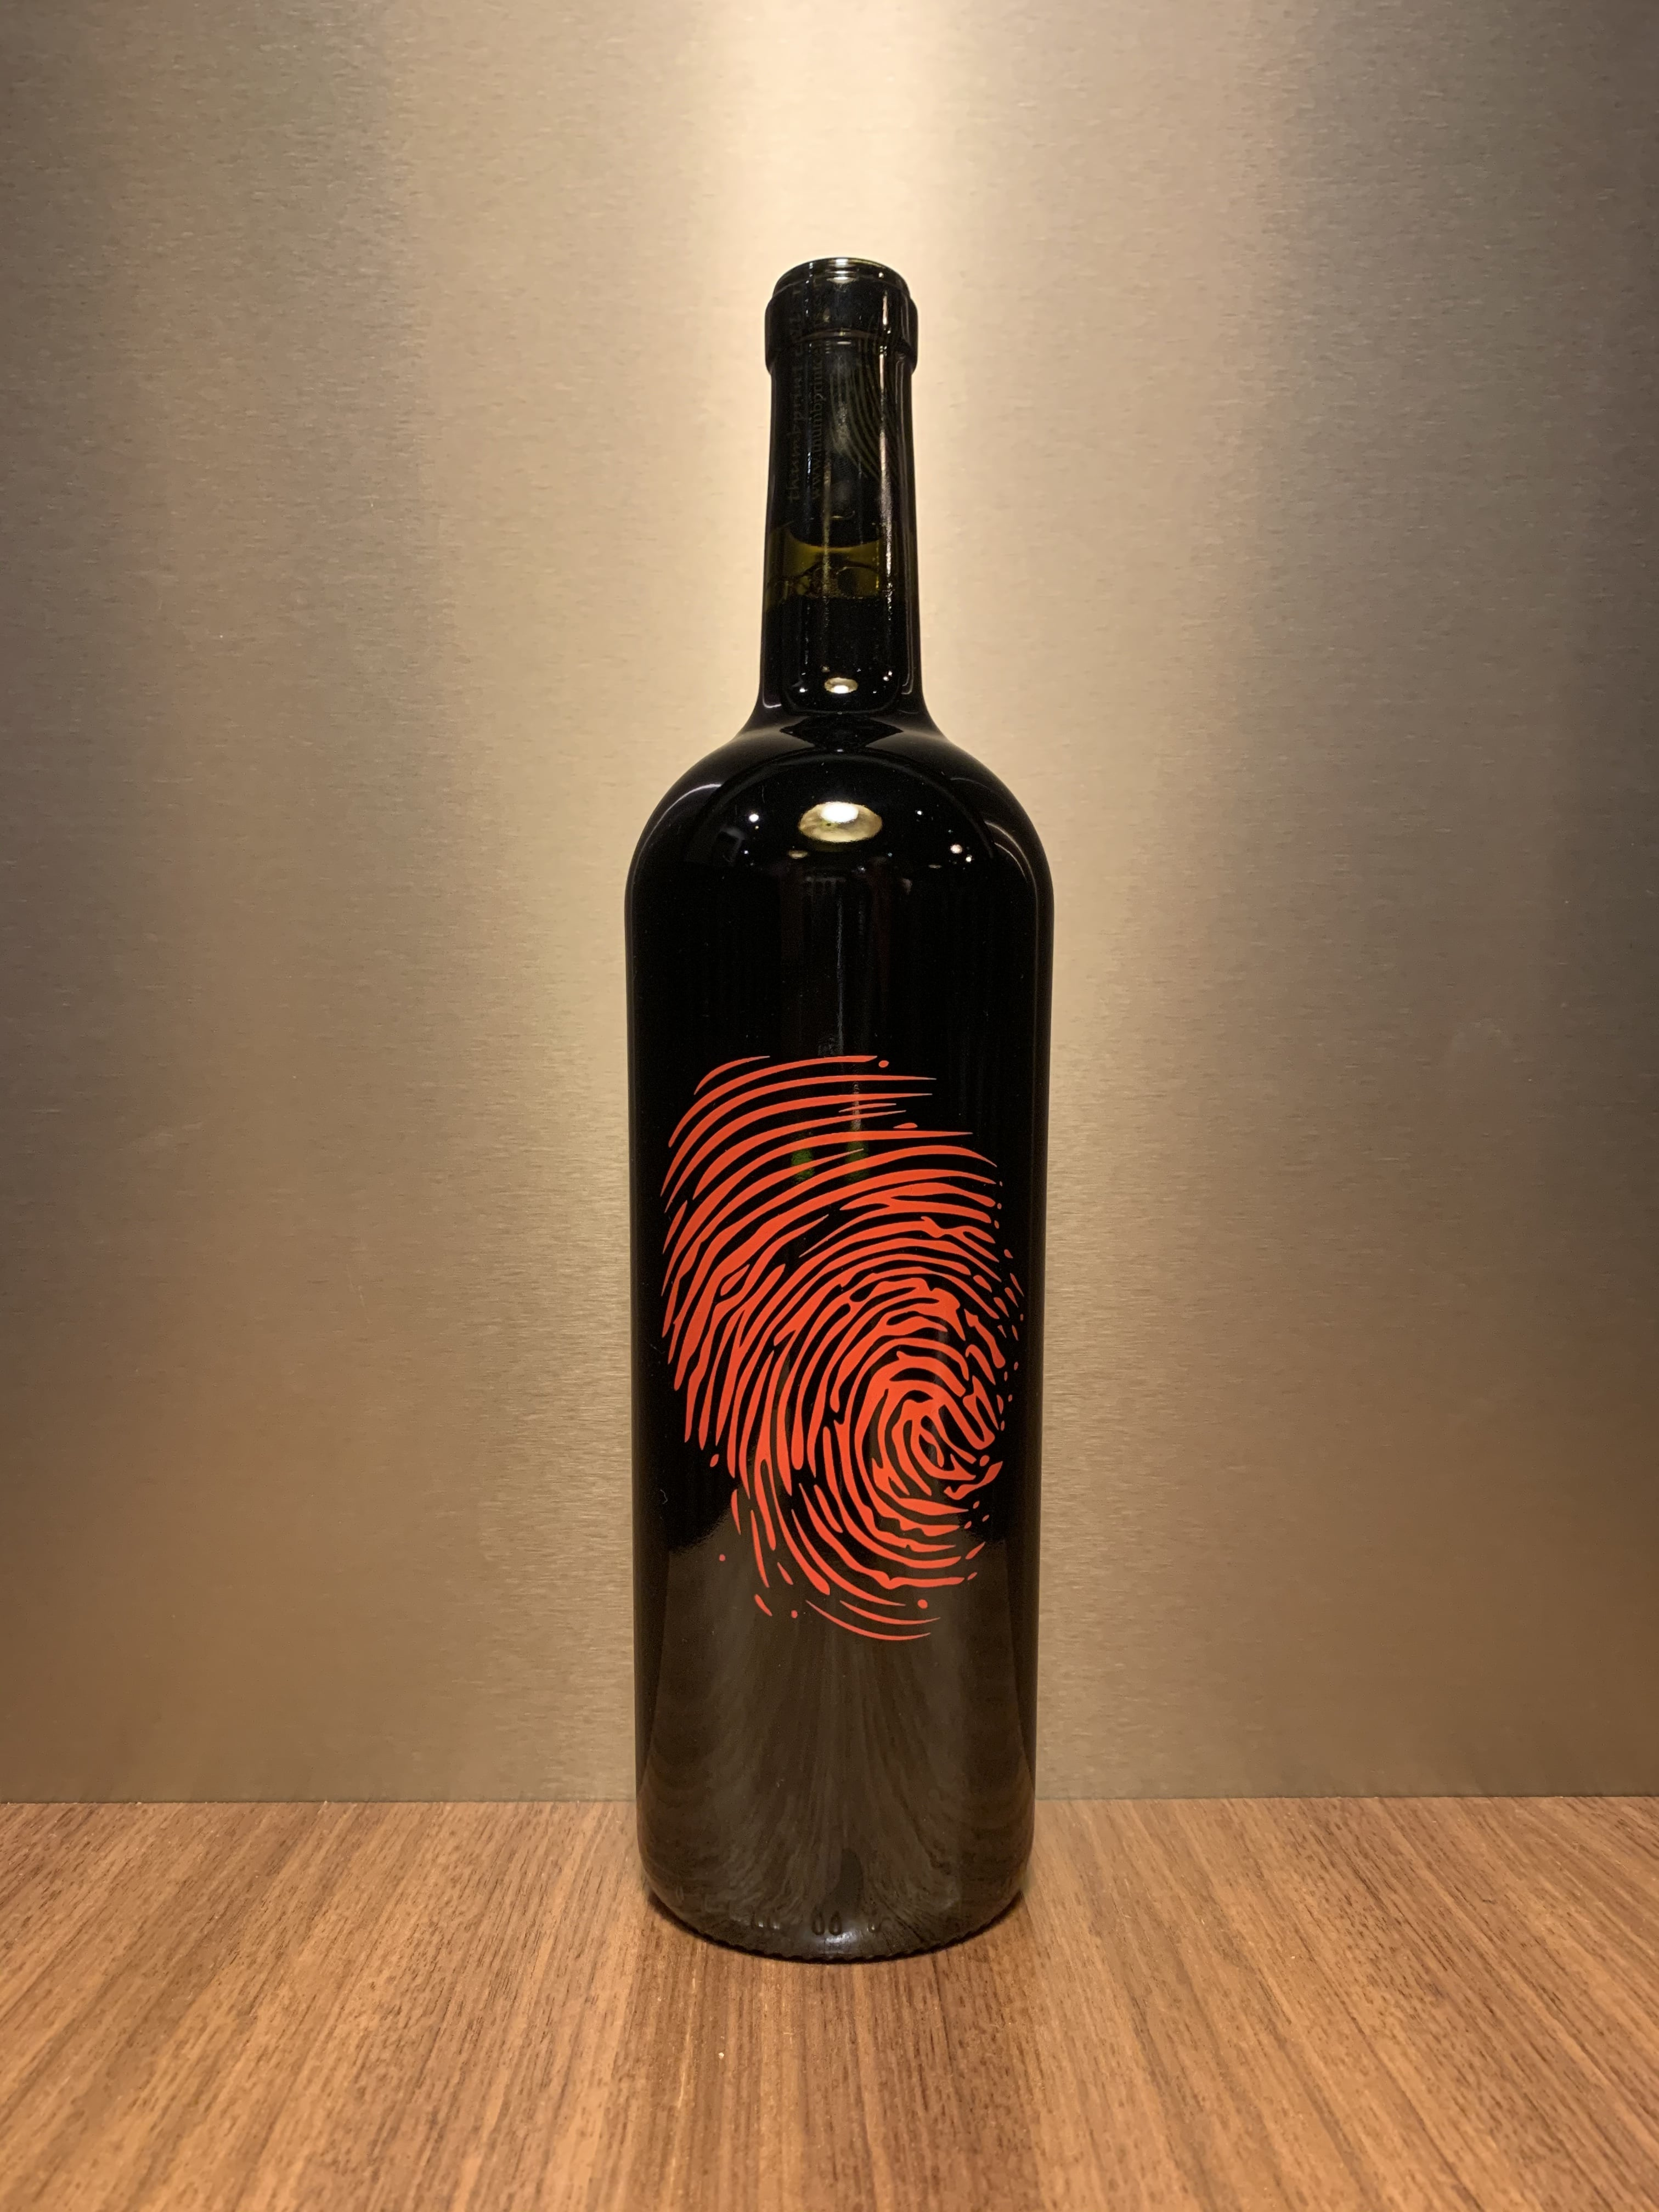 2010 Cabernet Sauvignon - Andolsen Vineyard